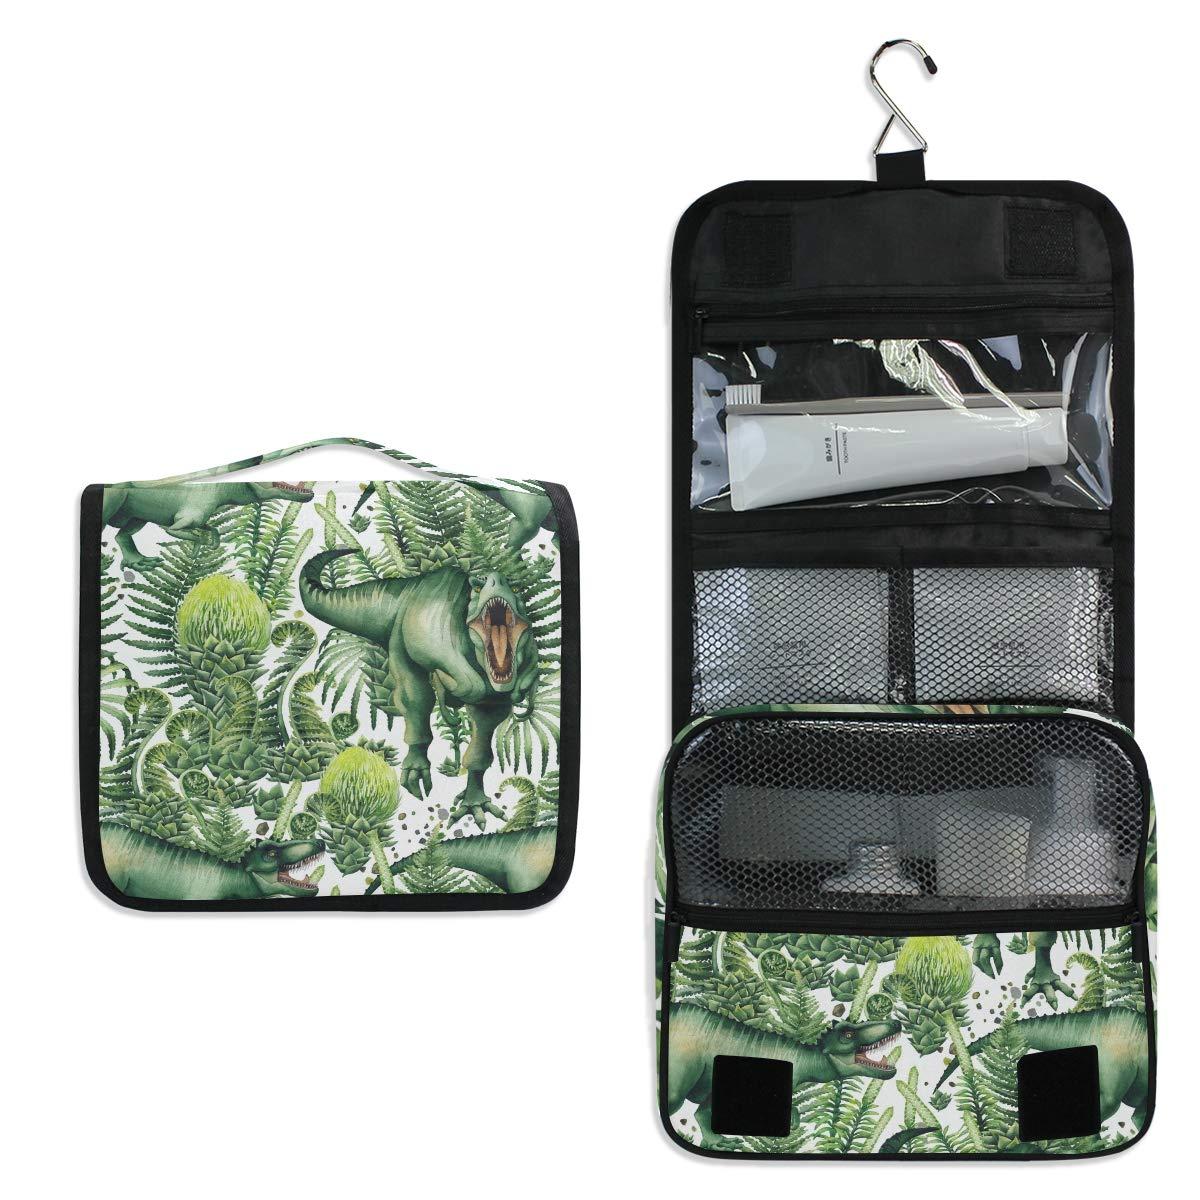 Toiletry Bag Travel Bag Hanging Hook - Watercolor Tyrannosaurus Green Plants Waterproof Cosmetic Bag Portable Makeup Pouch for Toiletries Bathroom